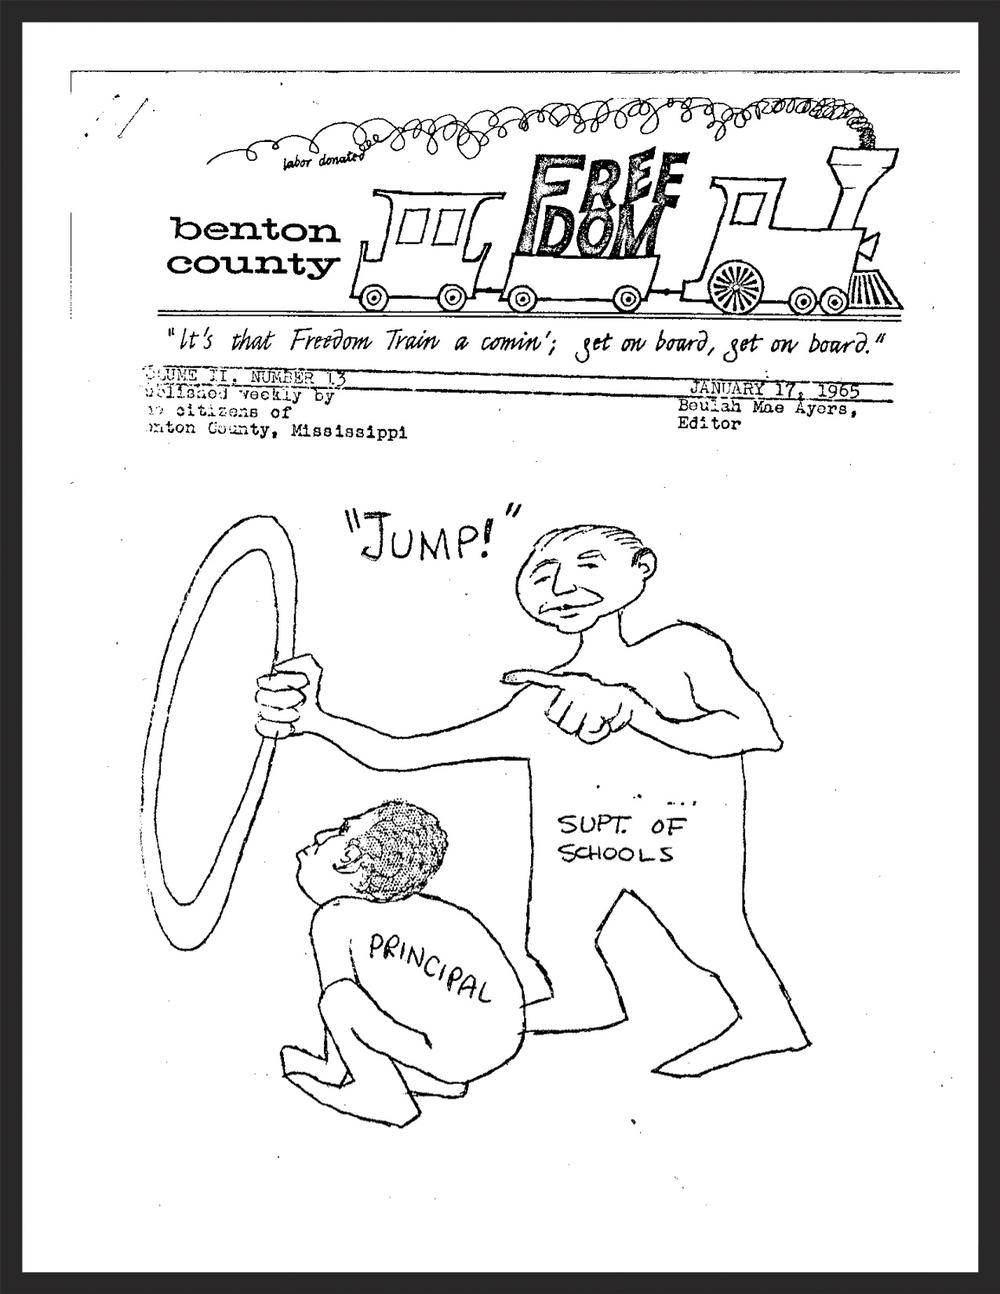 January 17, 1965